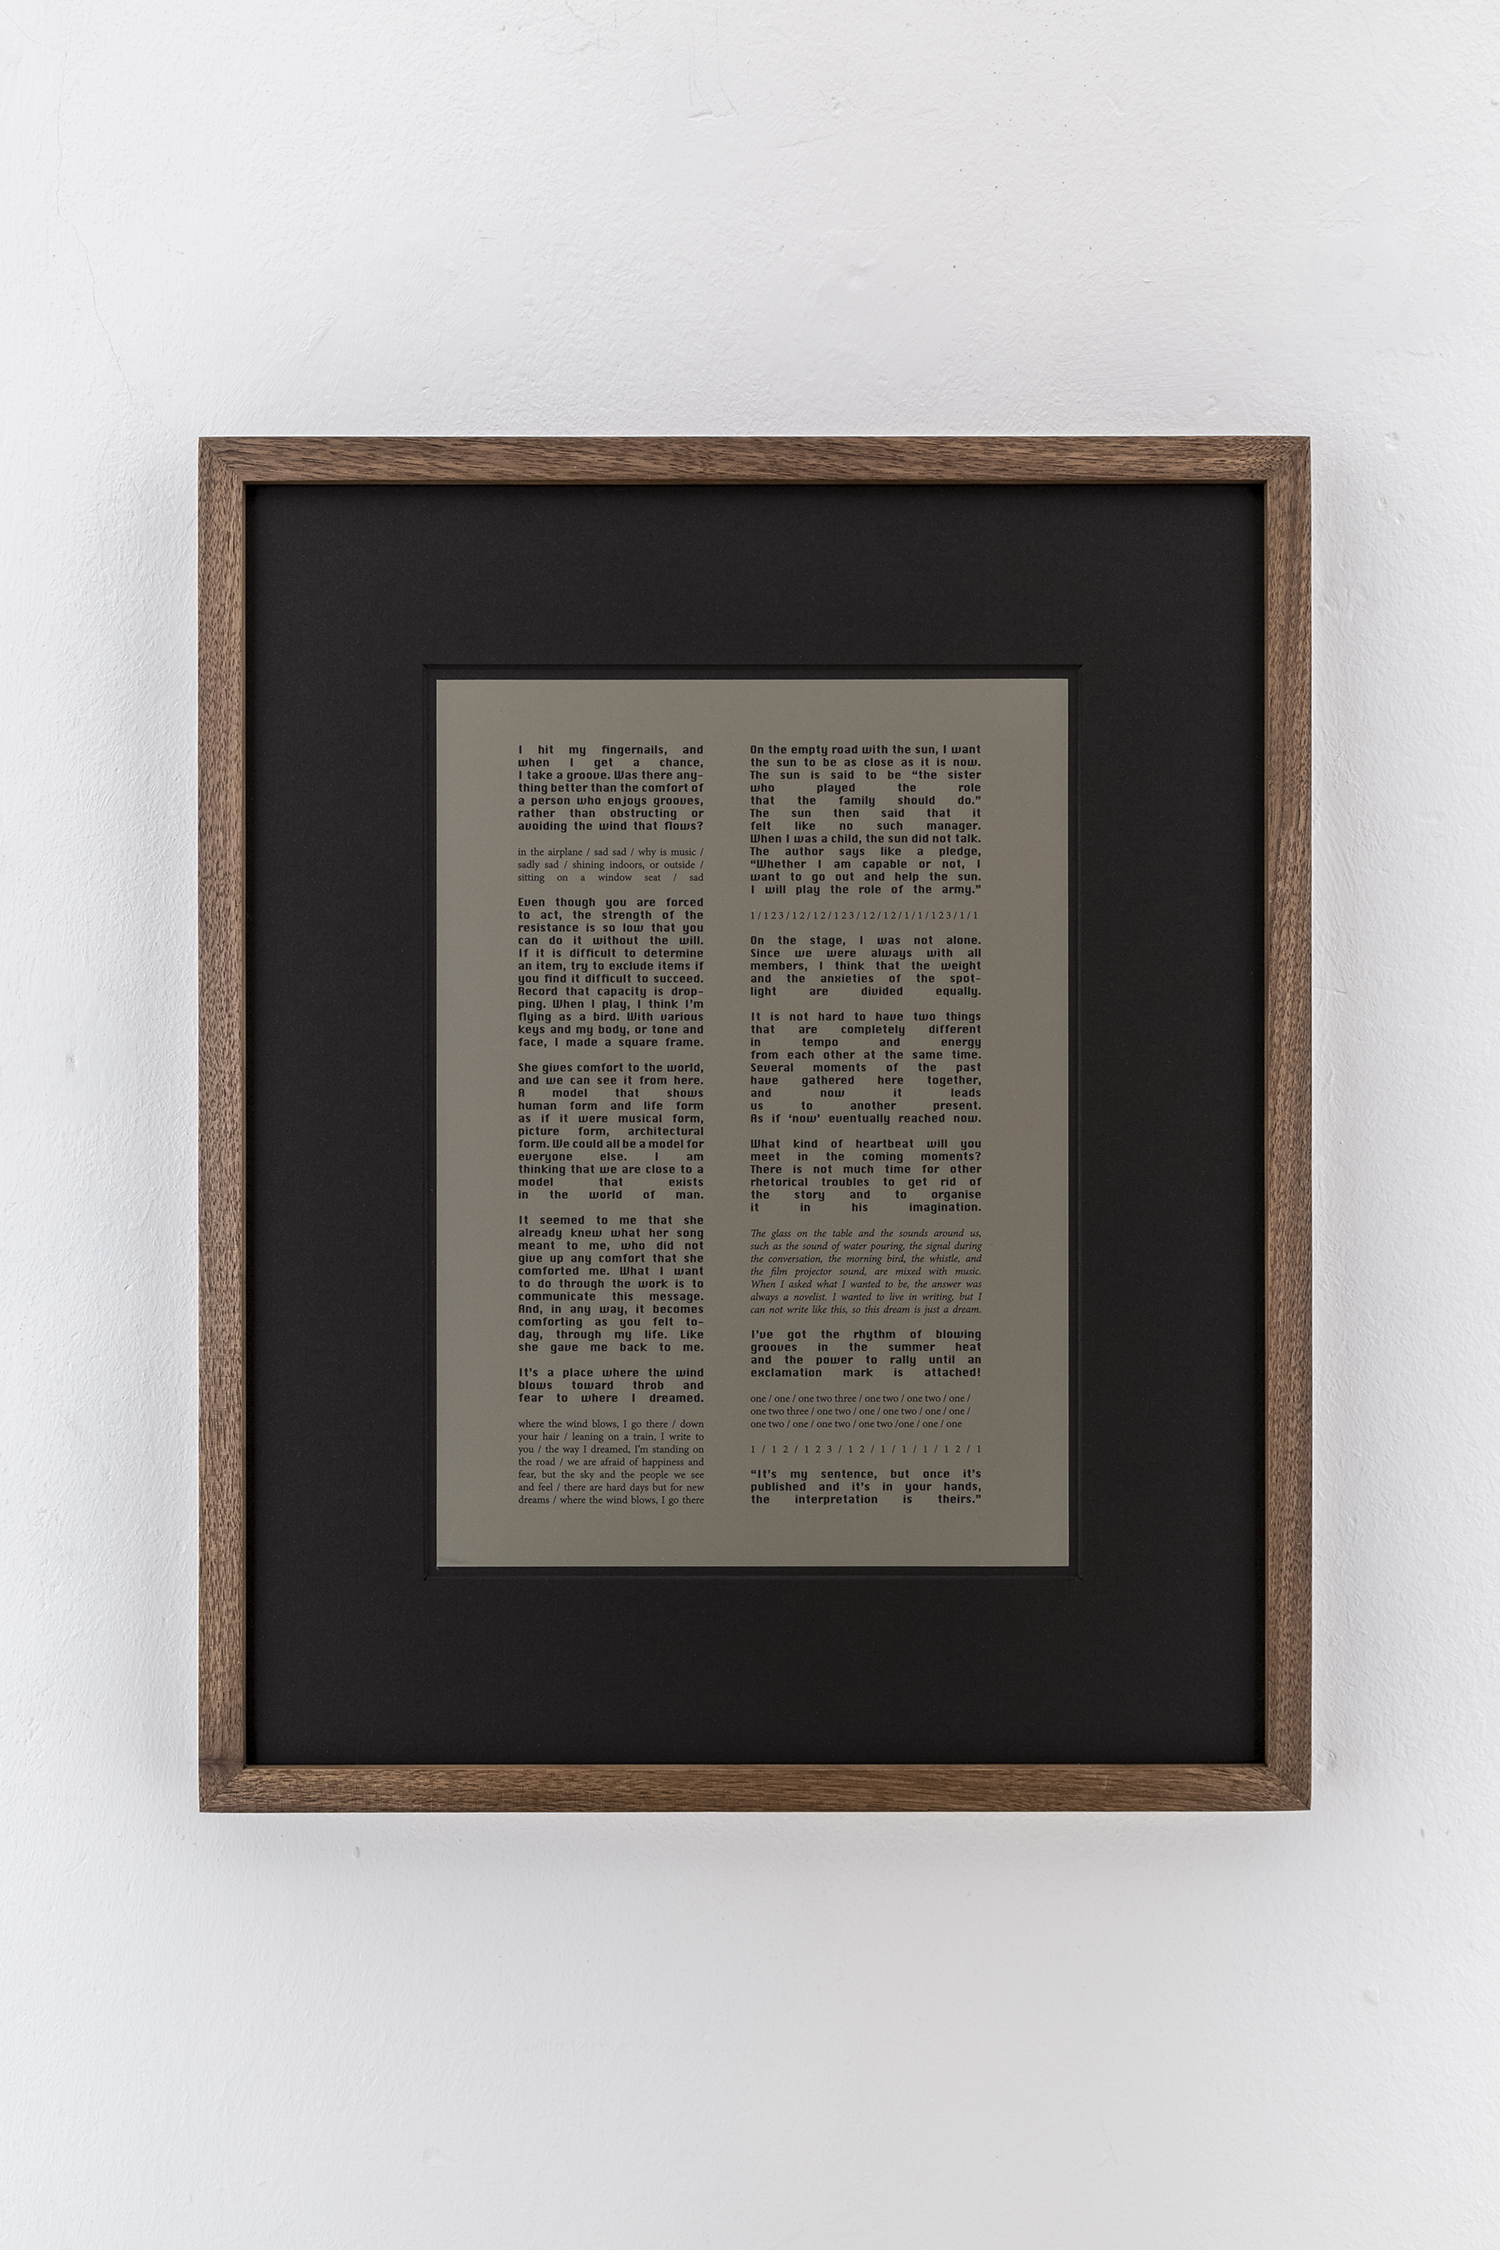 Anna Susanna Woof Untitled  2017  C-print  45.5 x 37 cm